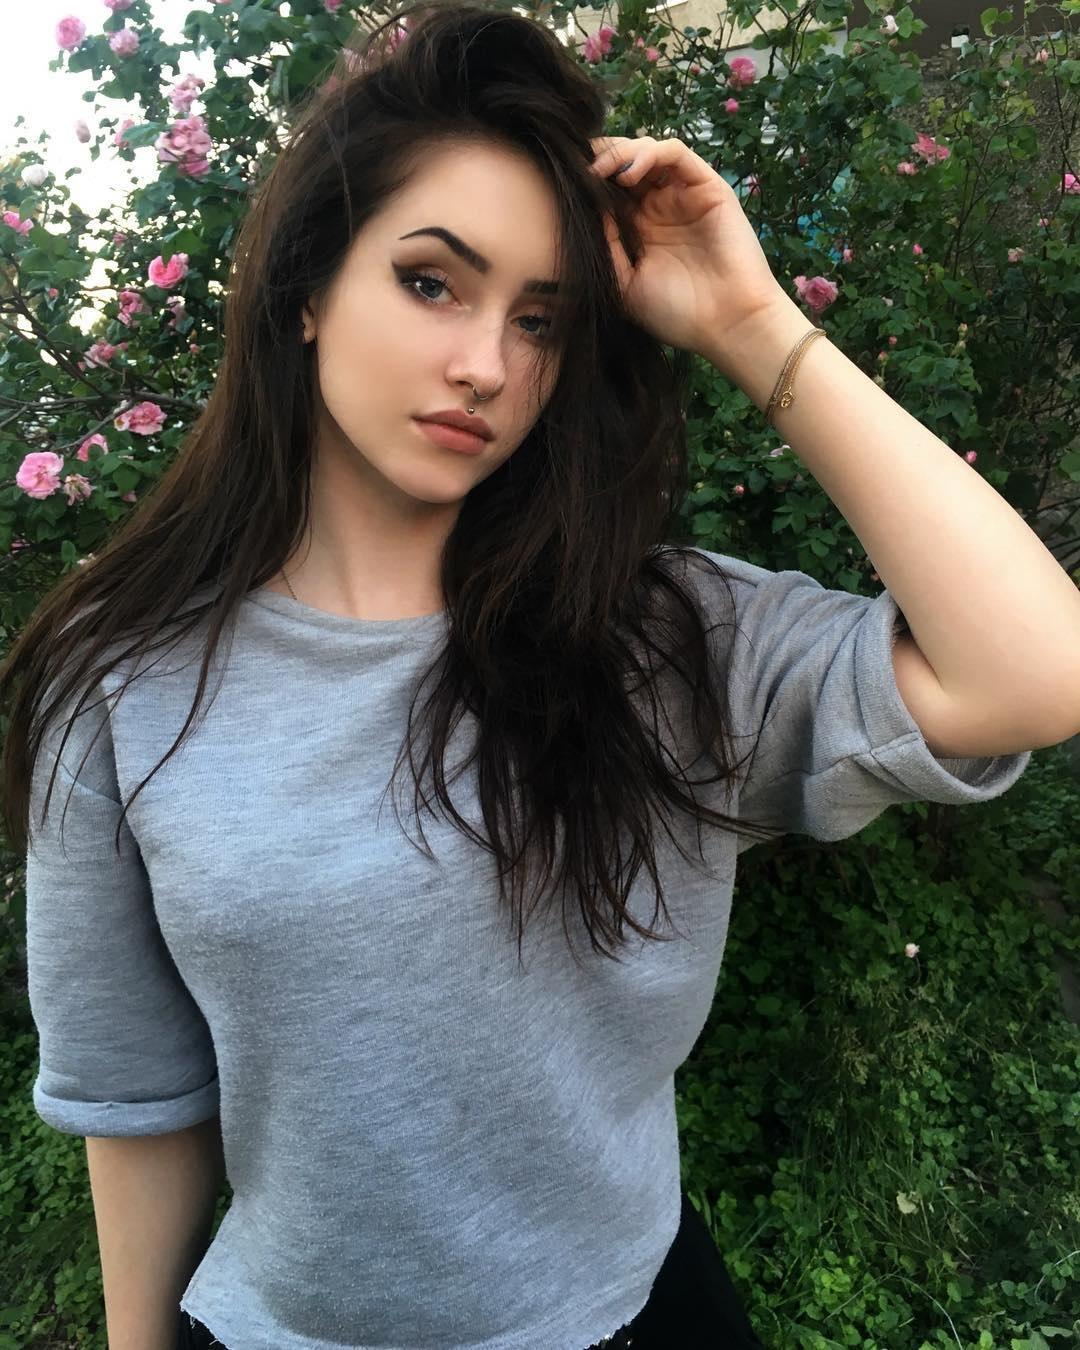 Anastasia-Mut-Wallpapers-Insta-Fit-Bio-10